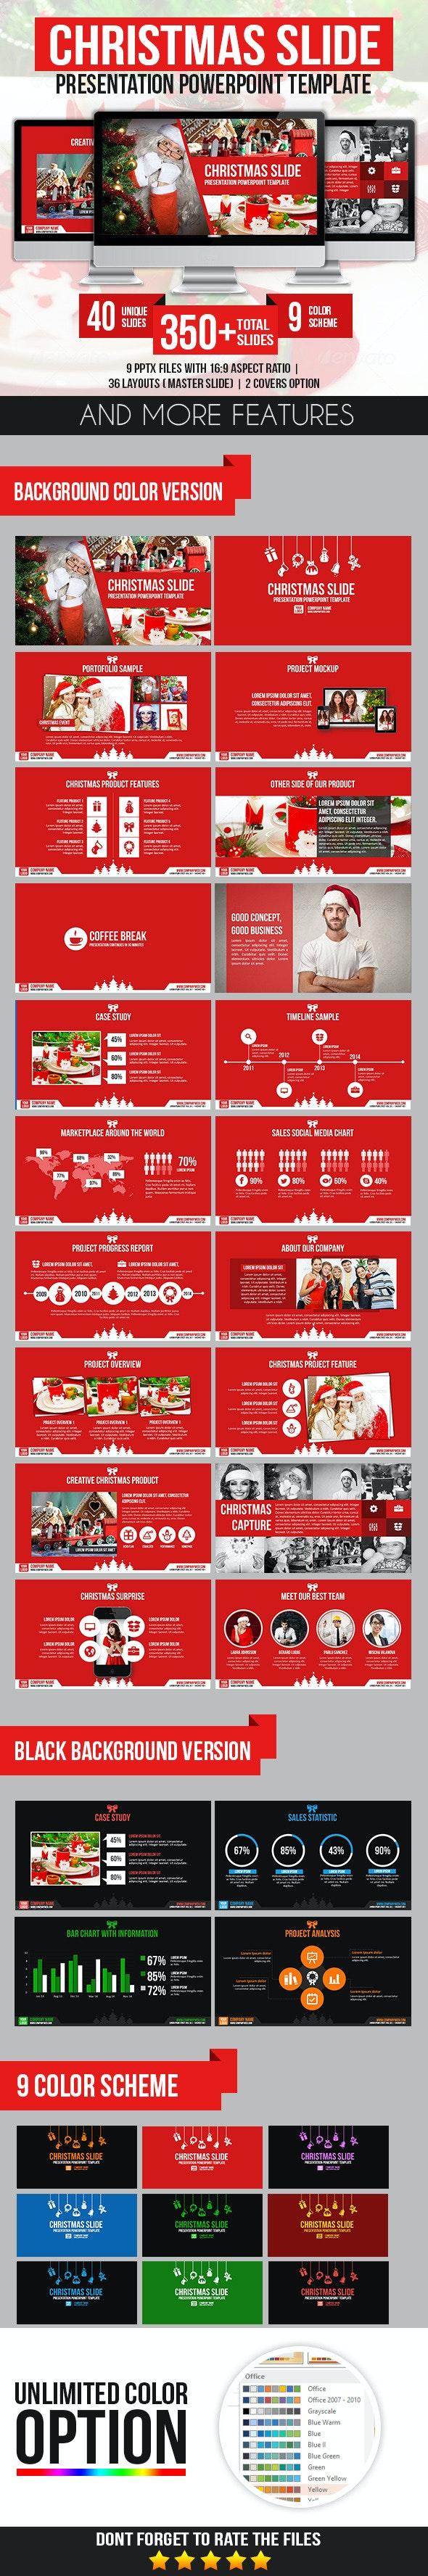 Christmas Slide Presentation PowerPoint Template - Business PowerPoint Templates